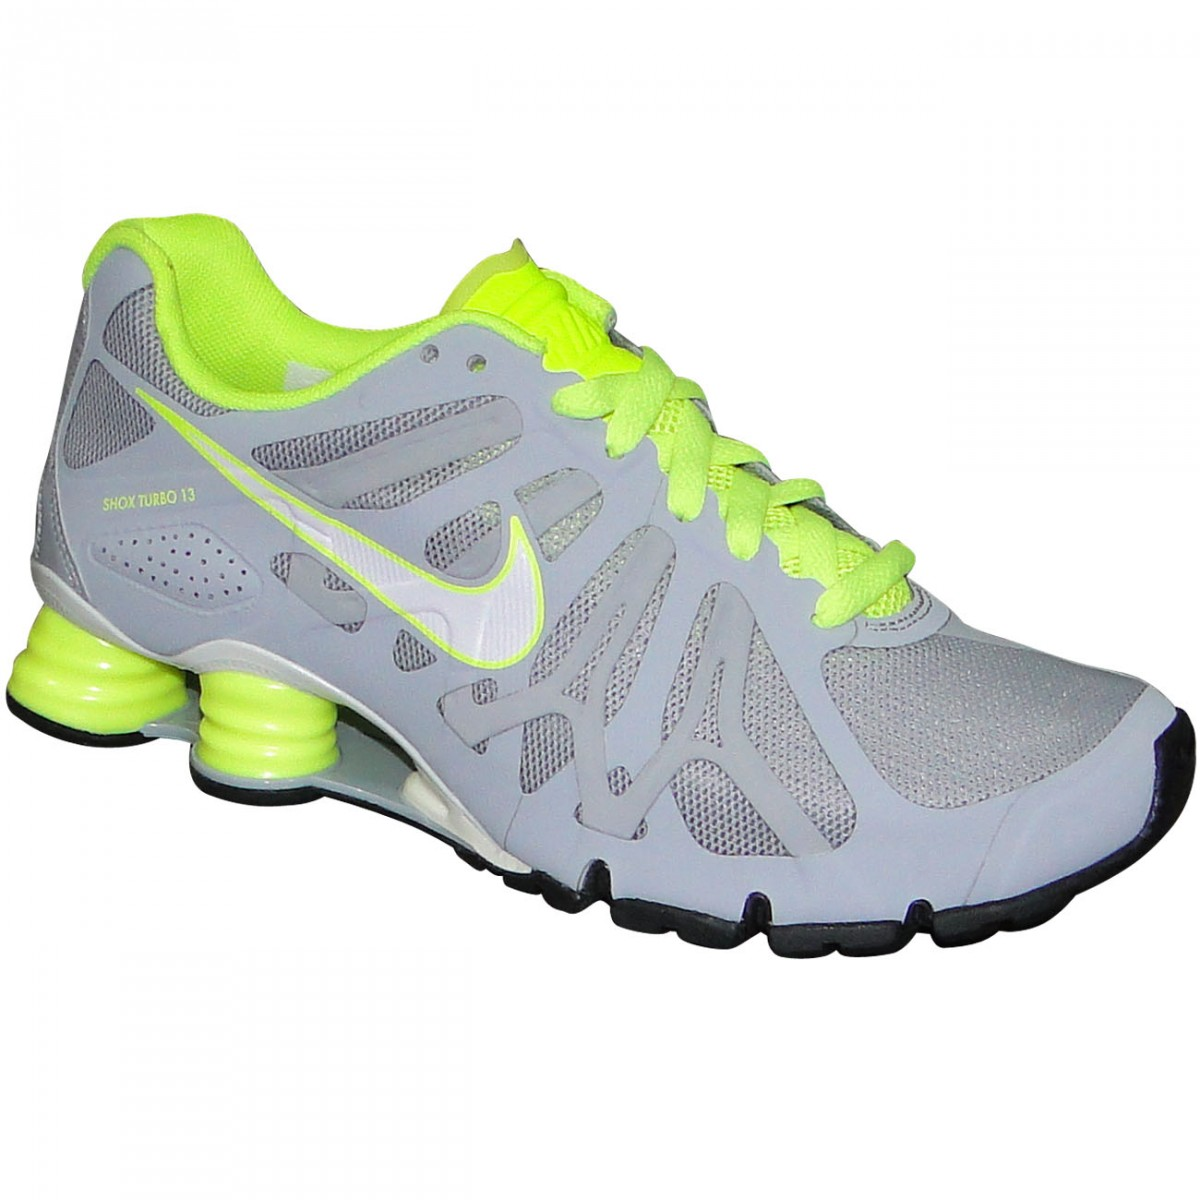 24cafe0dbdd3c Tenis Nike Shox Turbo + 13 525156 012 - Cinza/Limão - Chuteira Nike ...